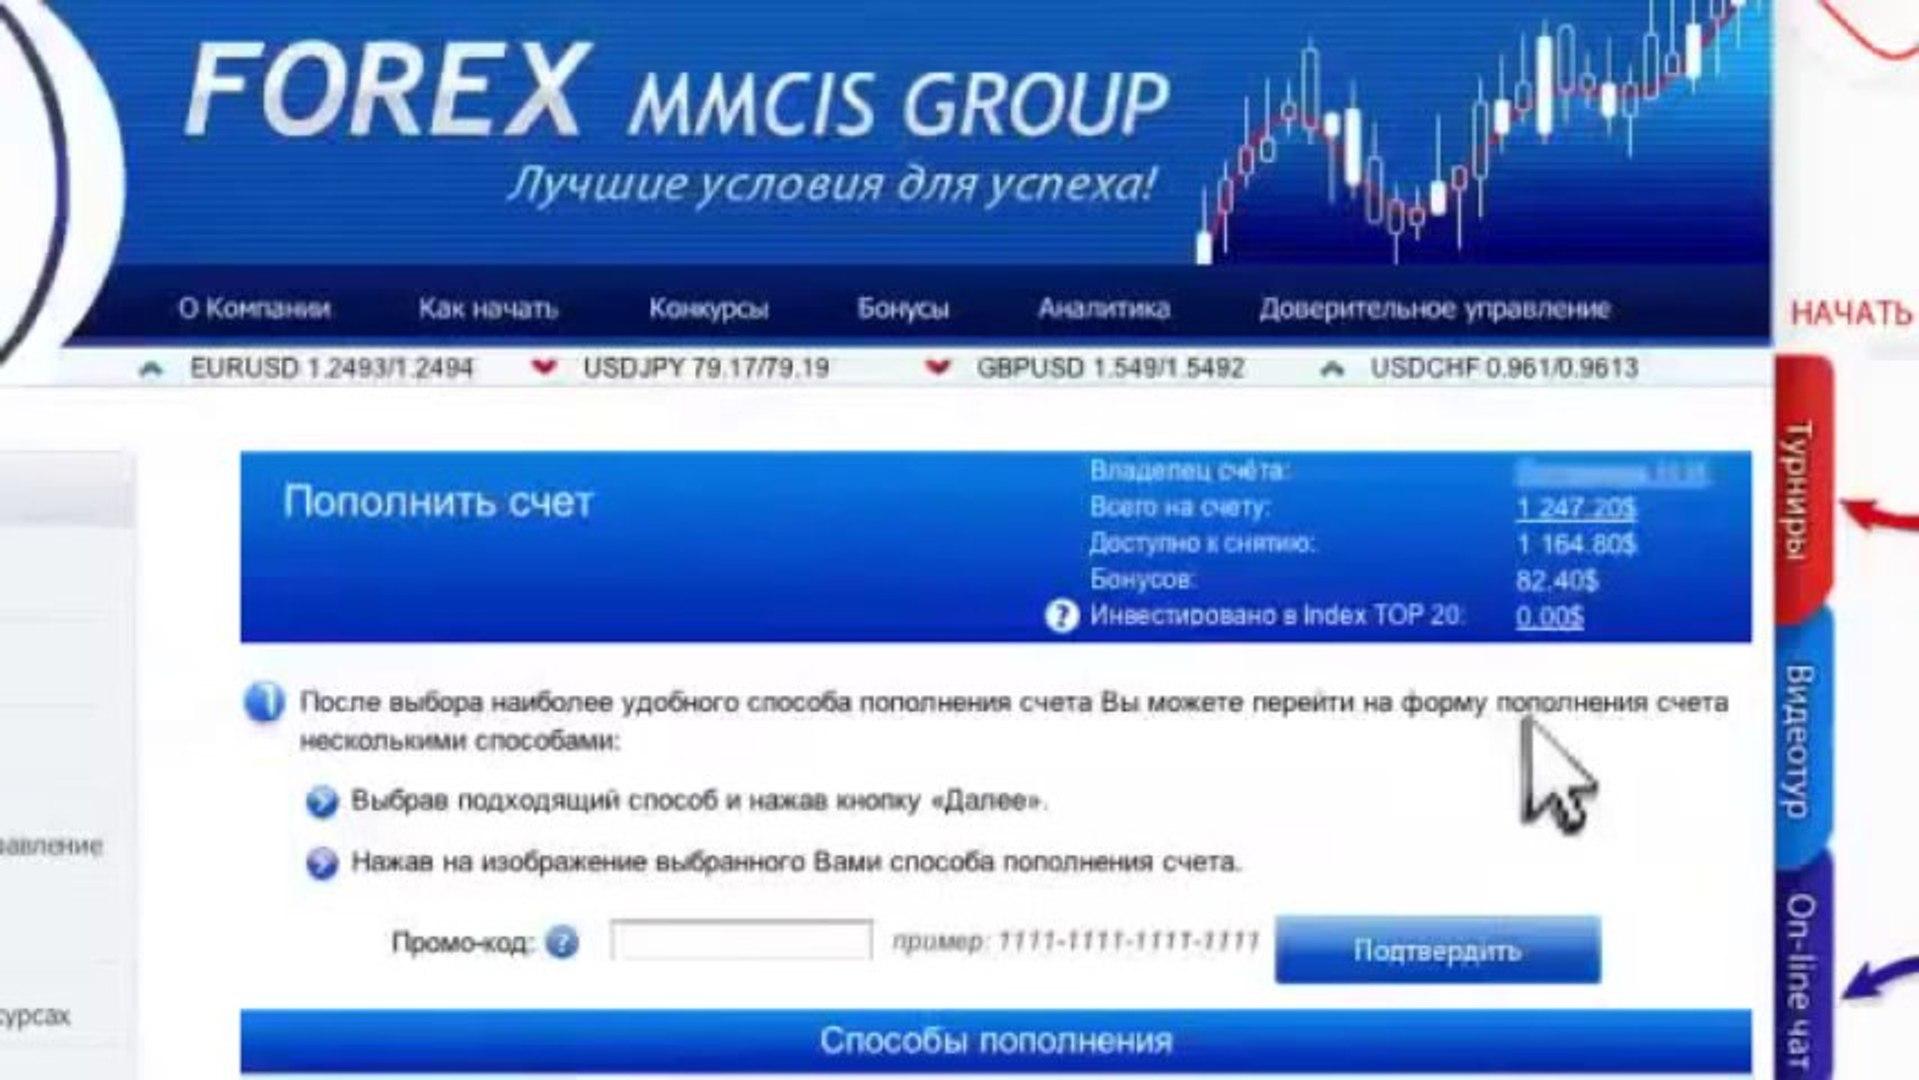 Forex mmcis group top 20 gavin houlihan lokey investment